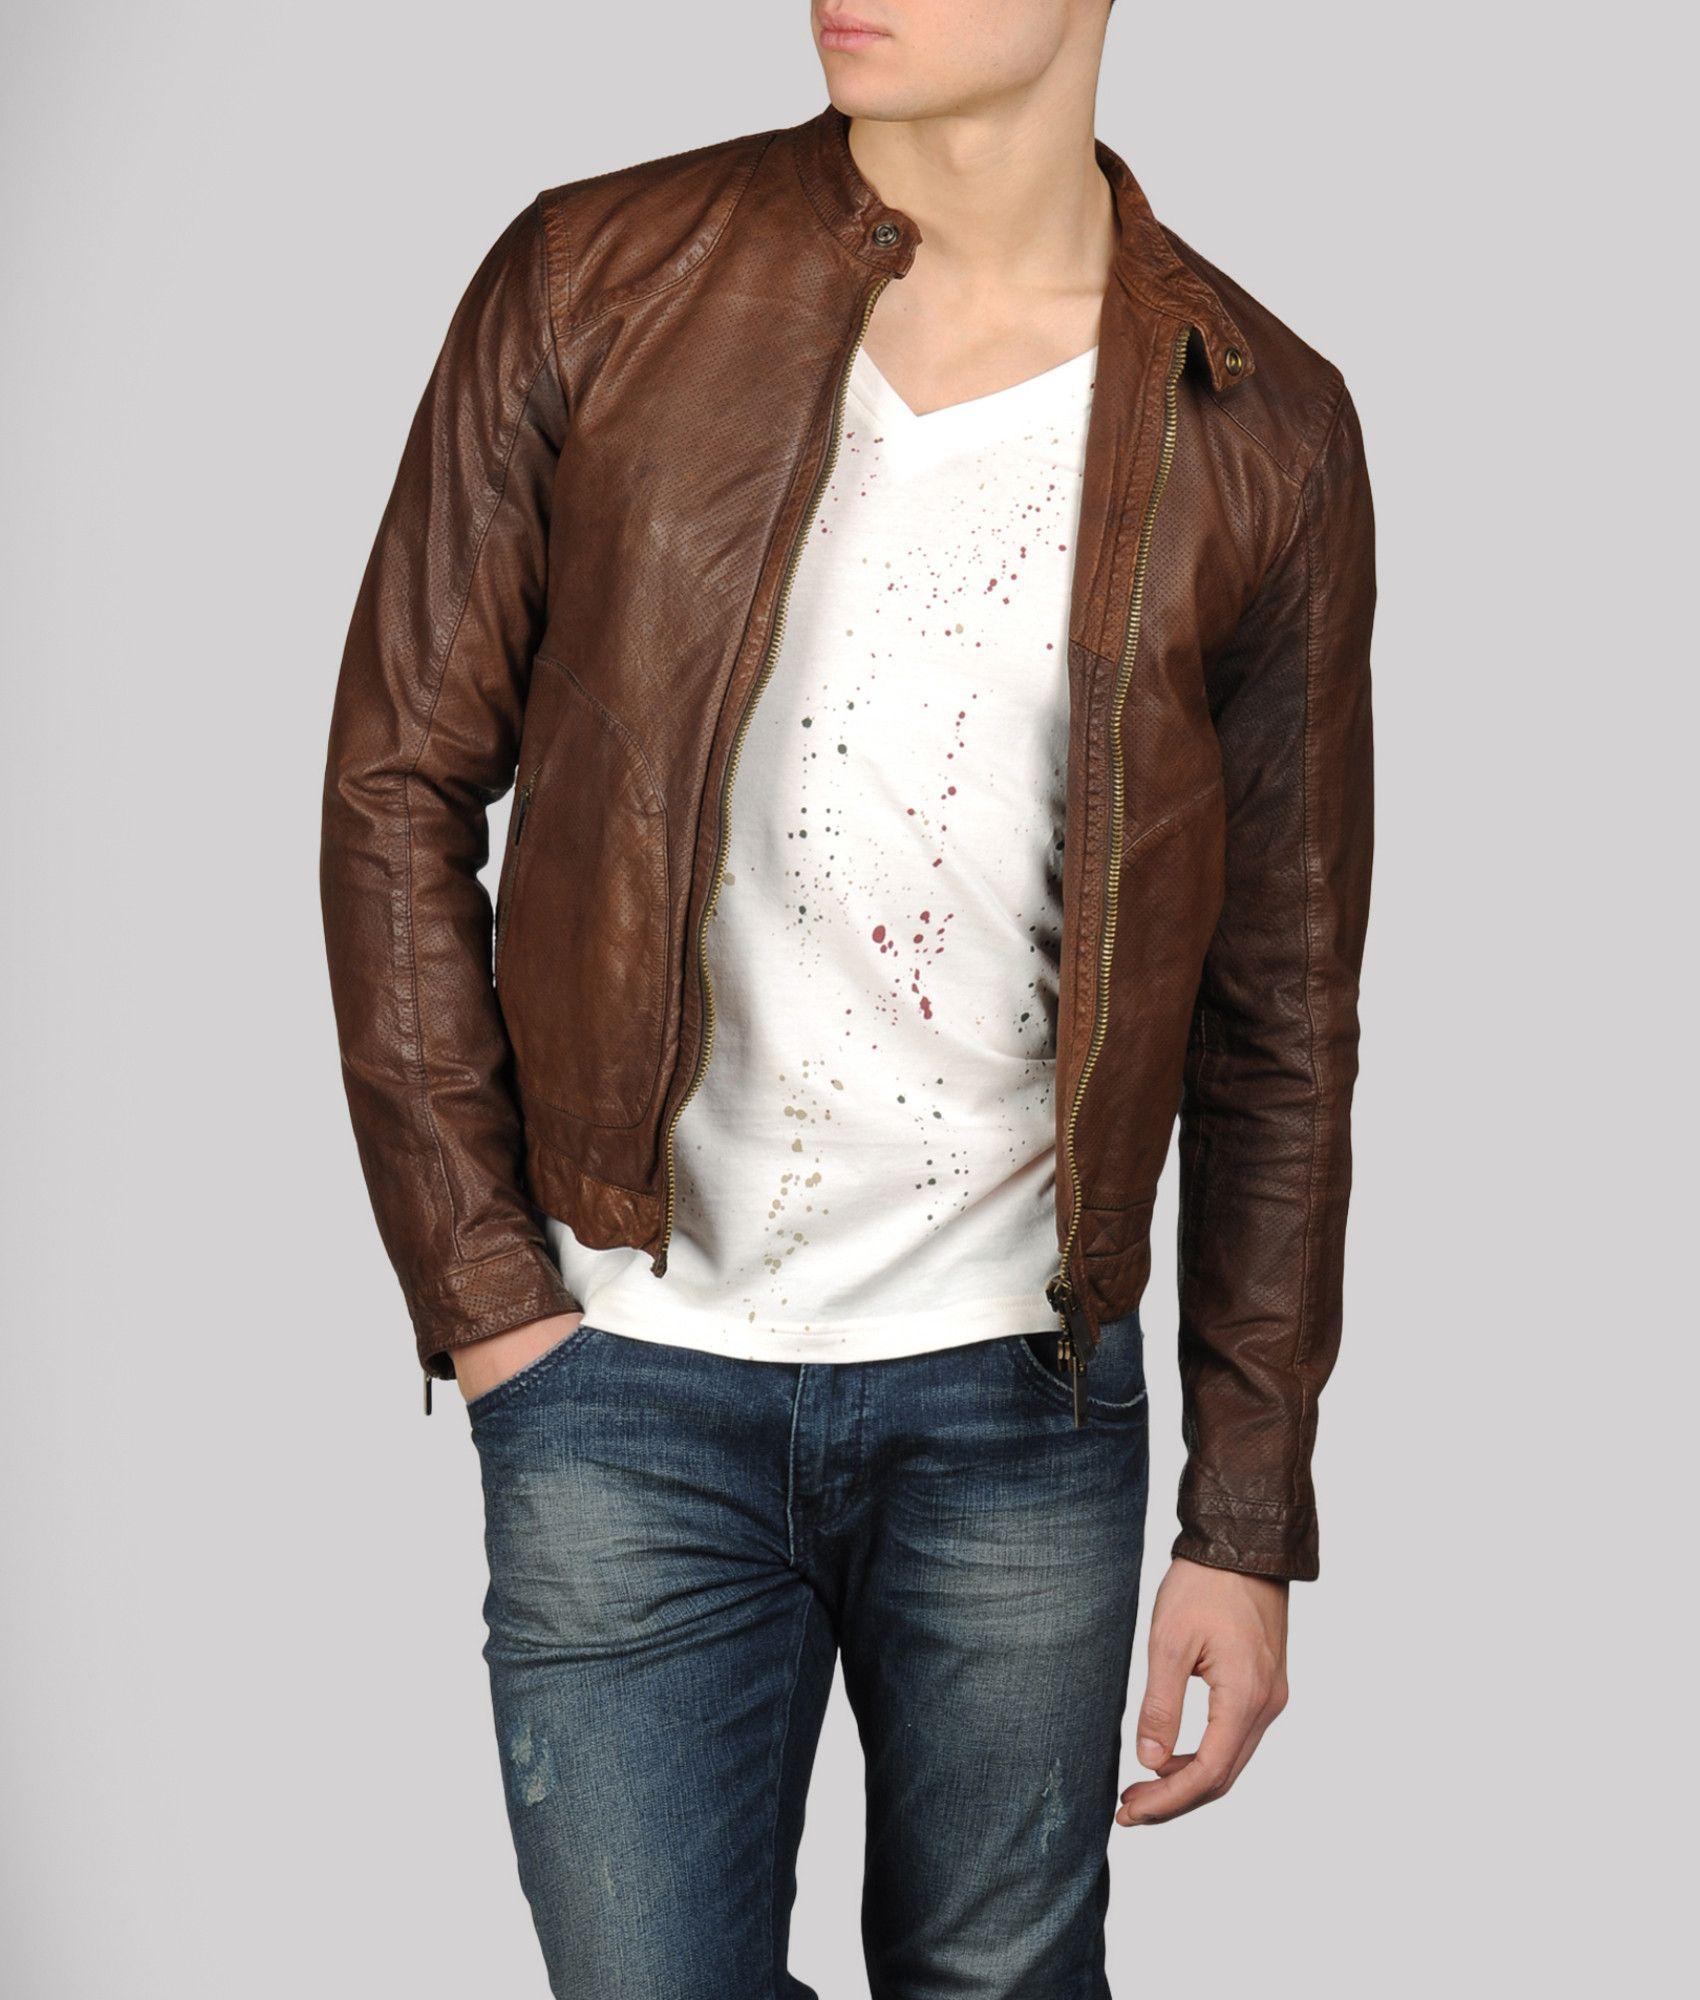 Armani Jeans Leather jacket Style Homme, Blouson Cuir, Mode Homme, Veste En  Cuir 55f16980f4b